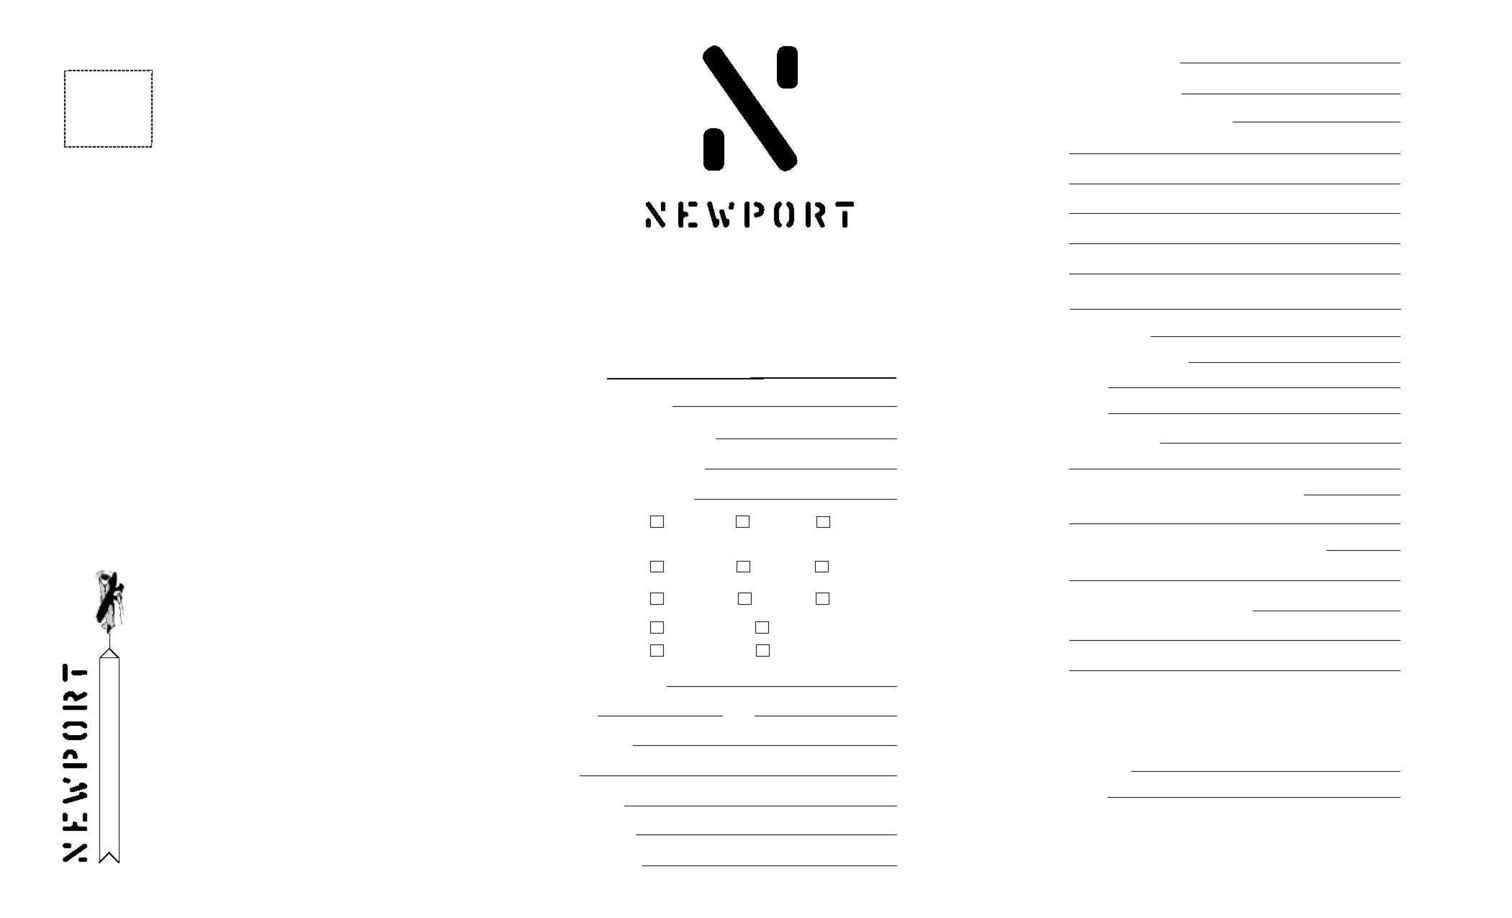 Newport Film Festival - niff application 2002